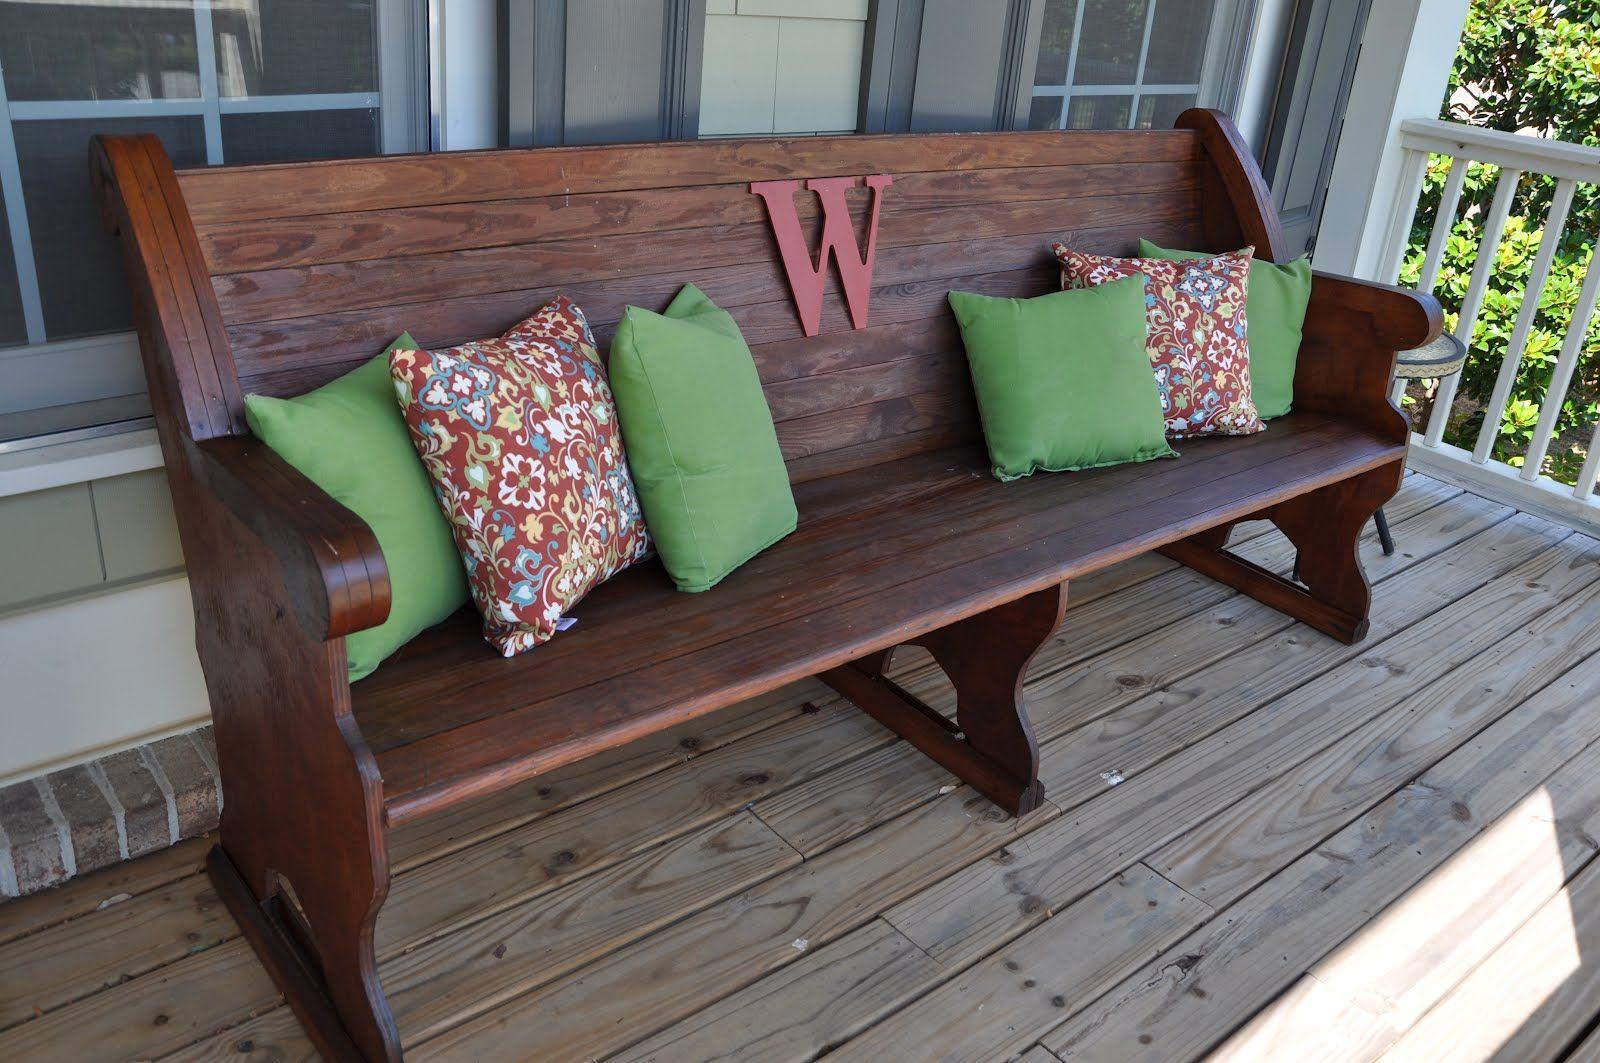 Church Pew Google Search Home Porch Life Design